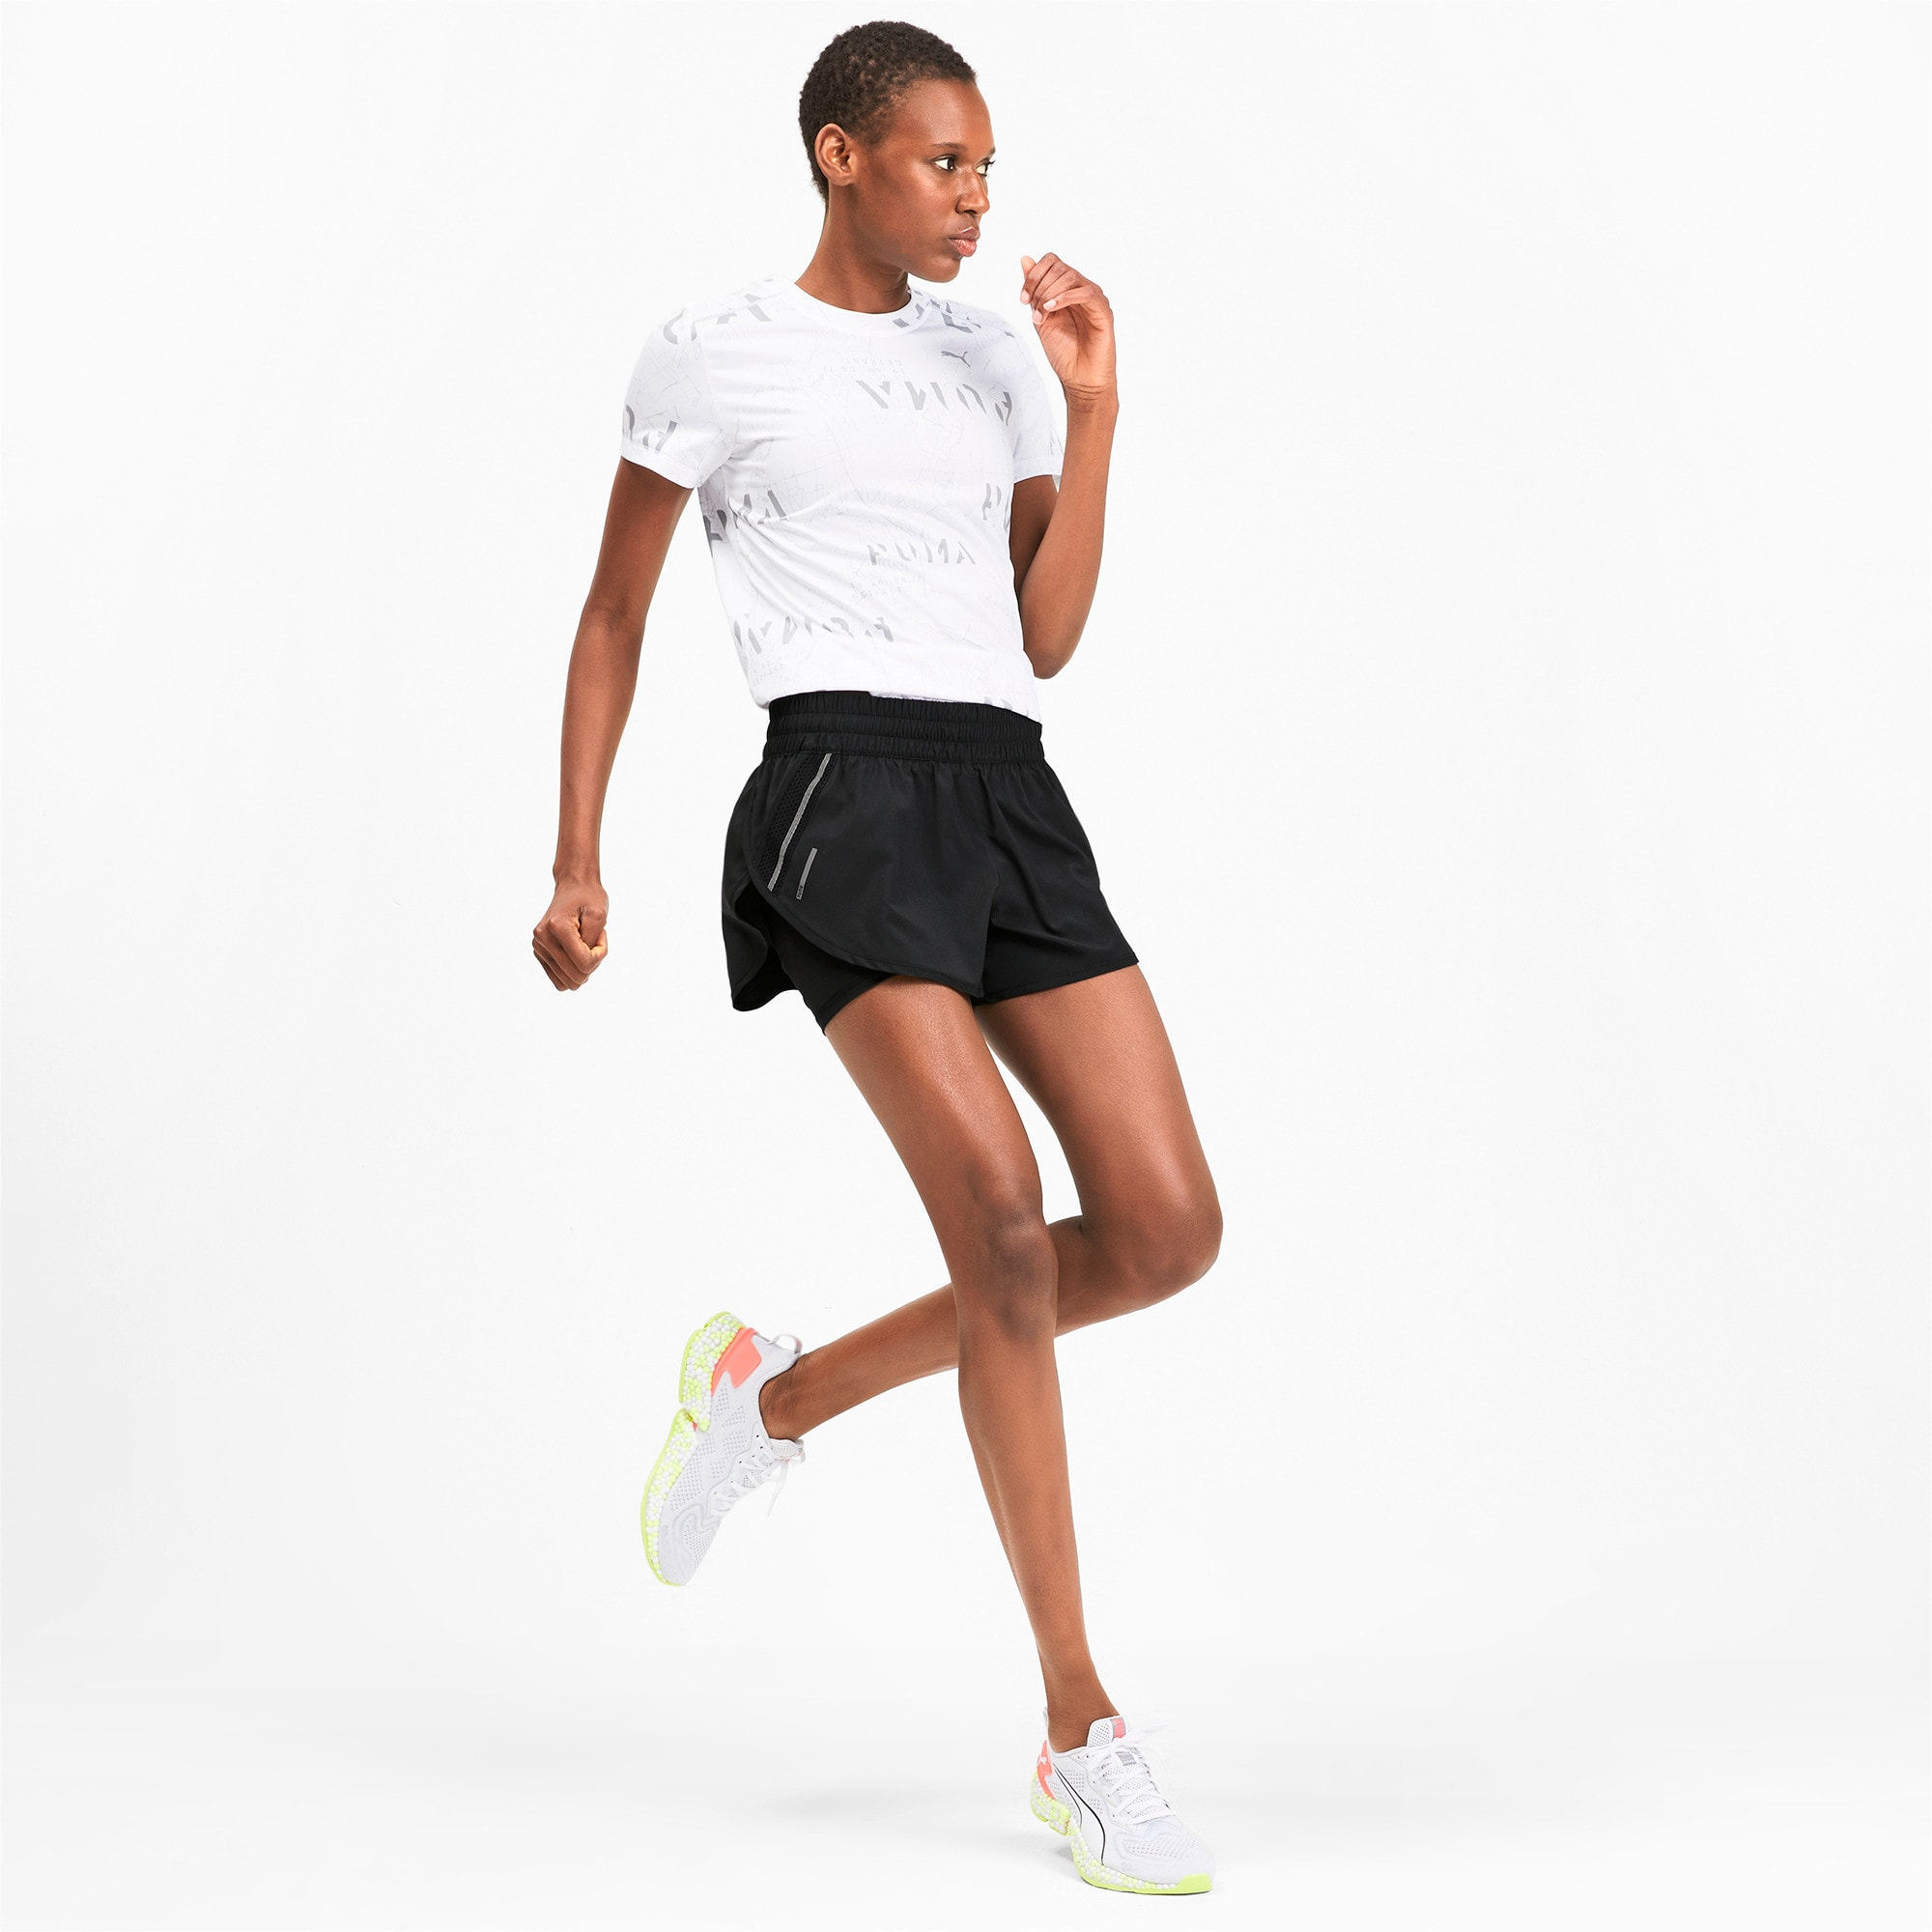 Thumbnail 3 of ADHM 2019 Last Lap Woven 2 in 1 Women's Running Shorts, Puma Black-Puma Black, medium-IND